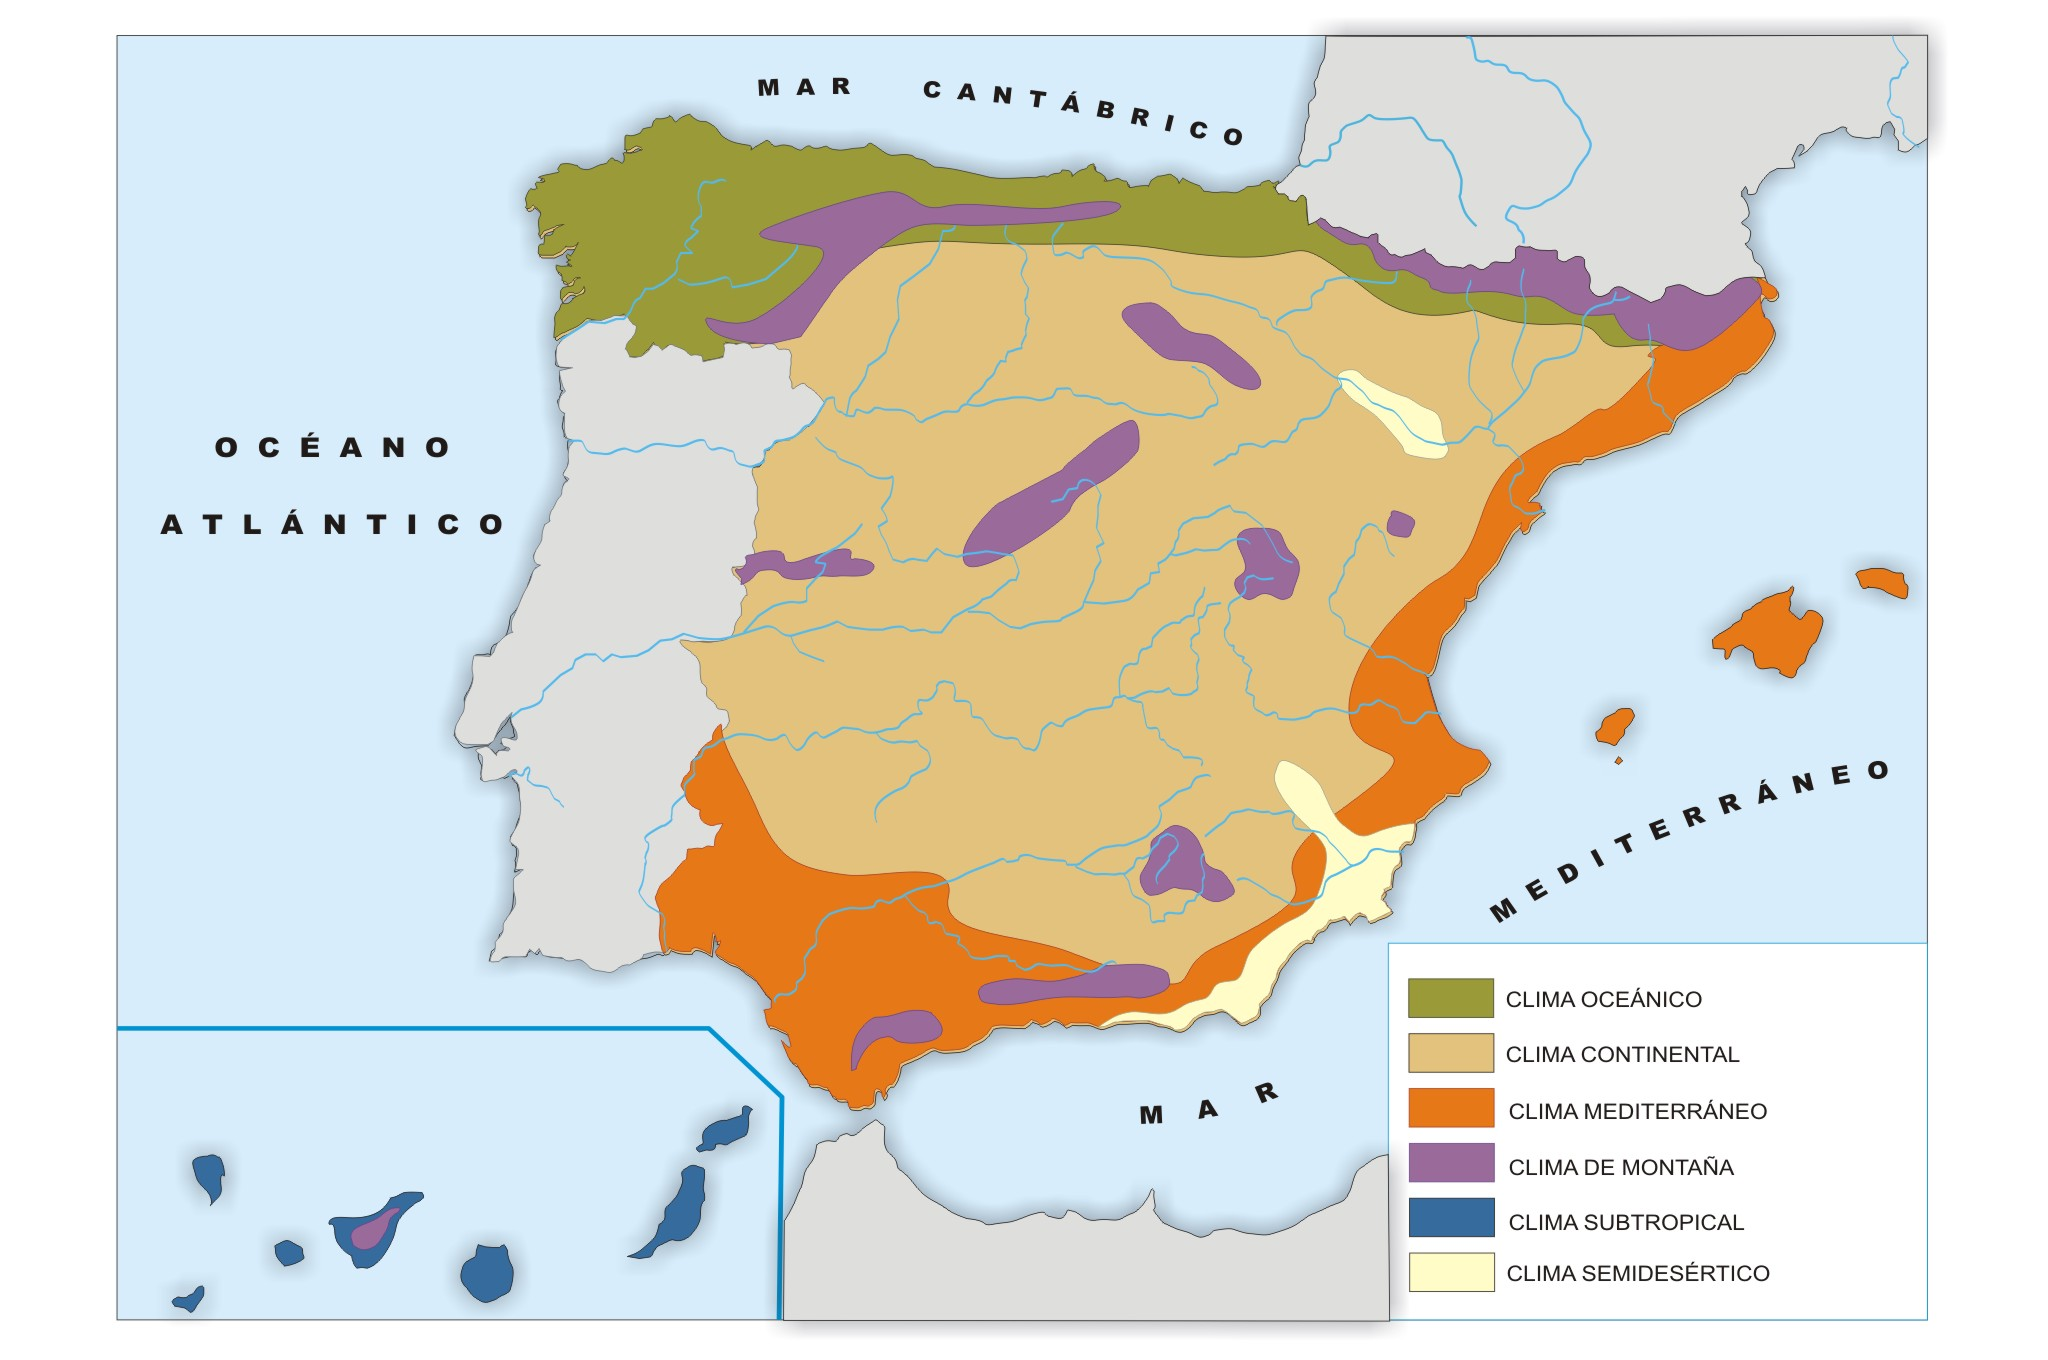 Imagen zonas climaticas de wikillerato for Ministerio del interior ubicacion mapa